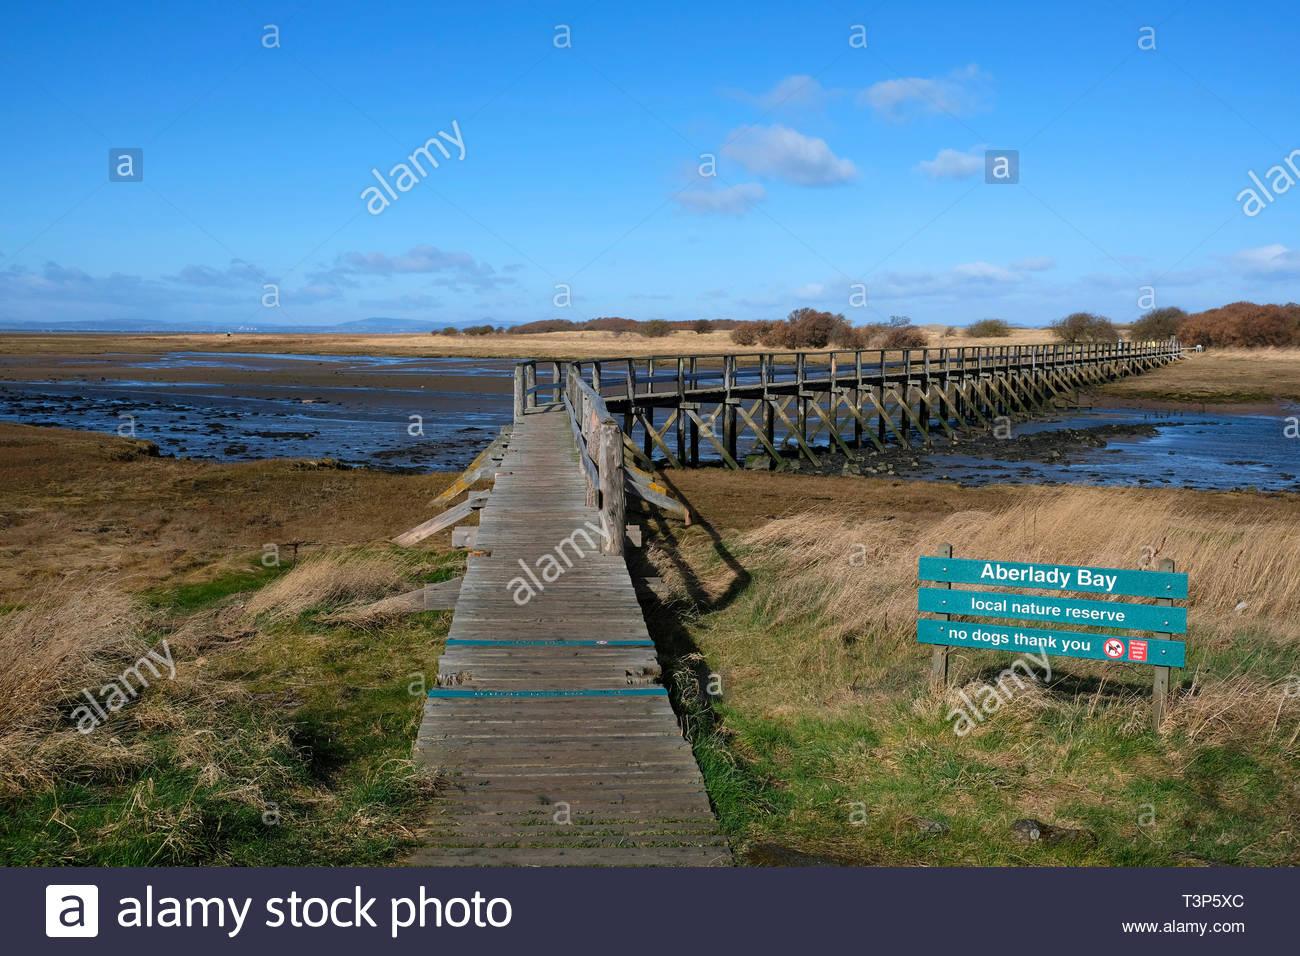 Aberlady Bay Nature Reserve, East Lothian, Scotland Stock Photo ...